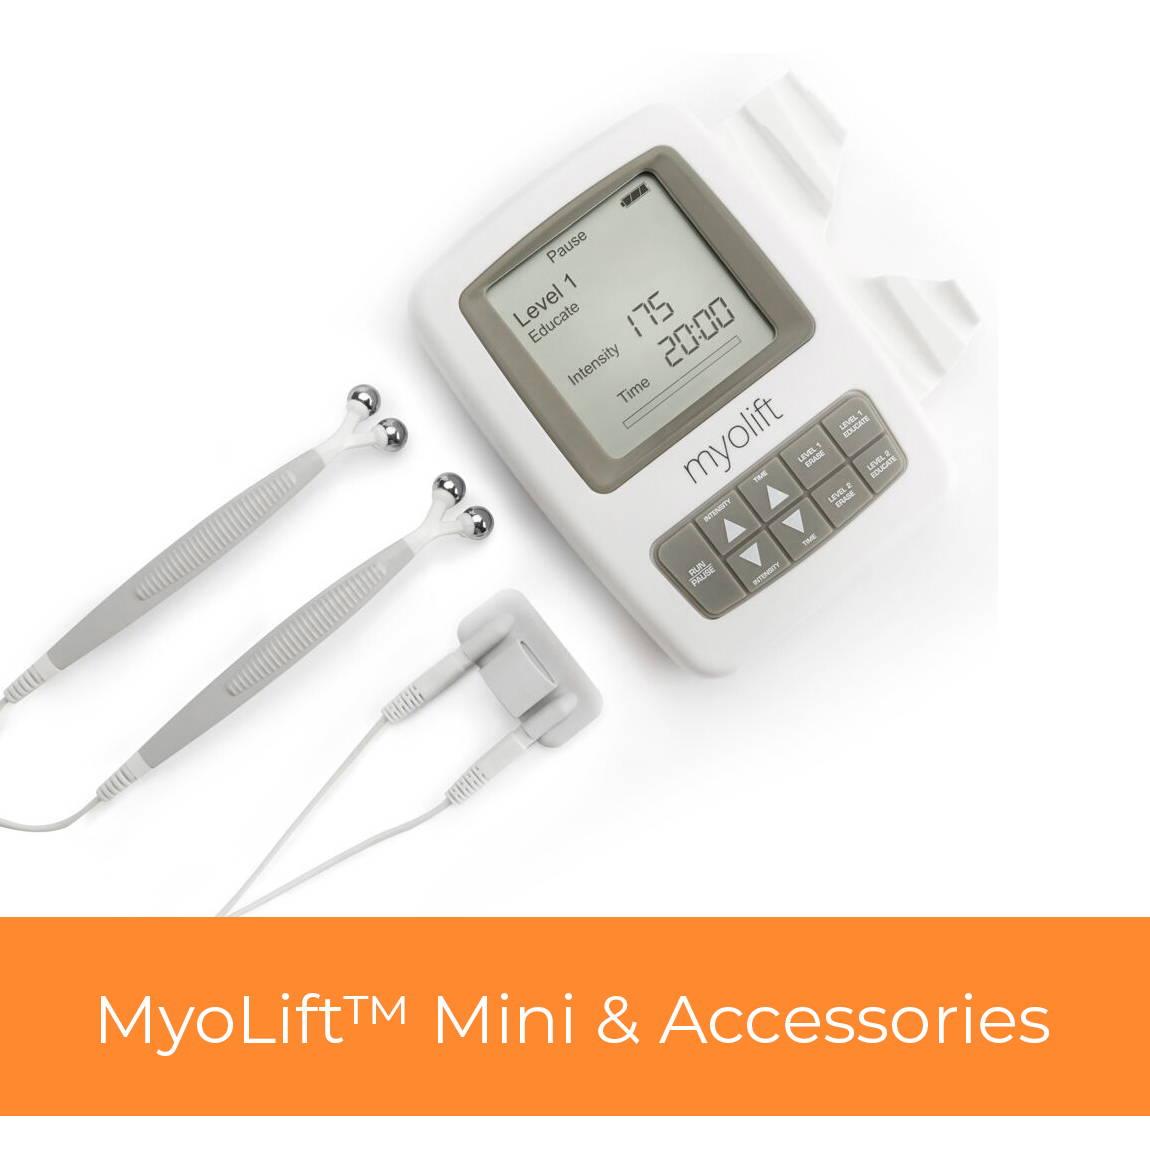 myolift mini microcurrent machine and accessories